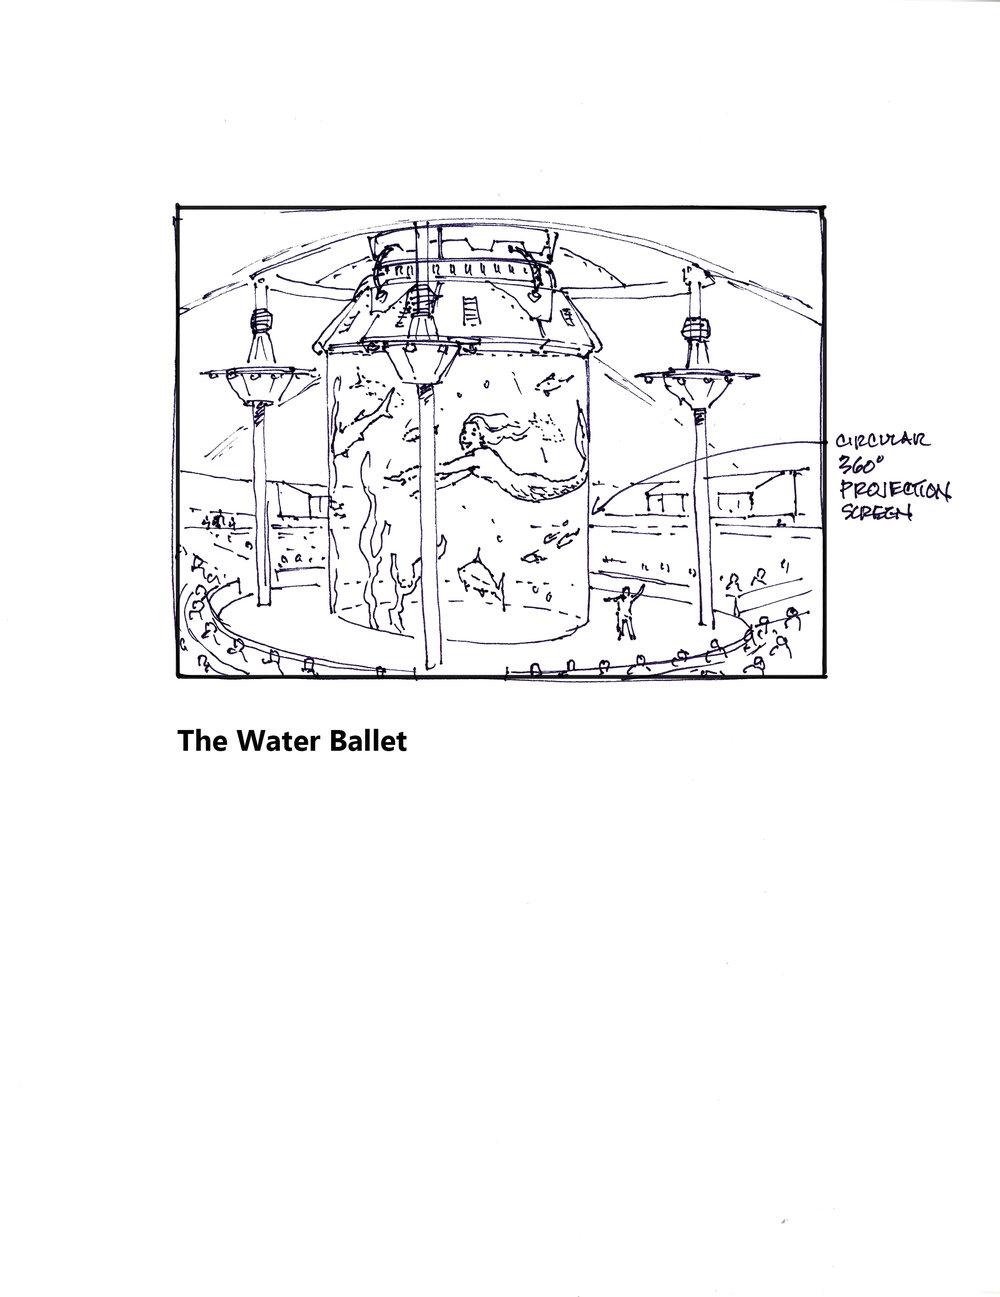 The Water Ballet 2.jpg